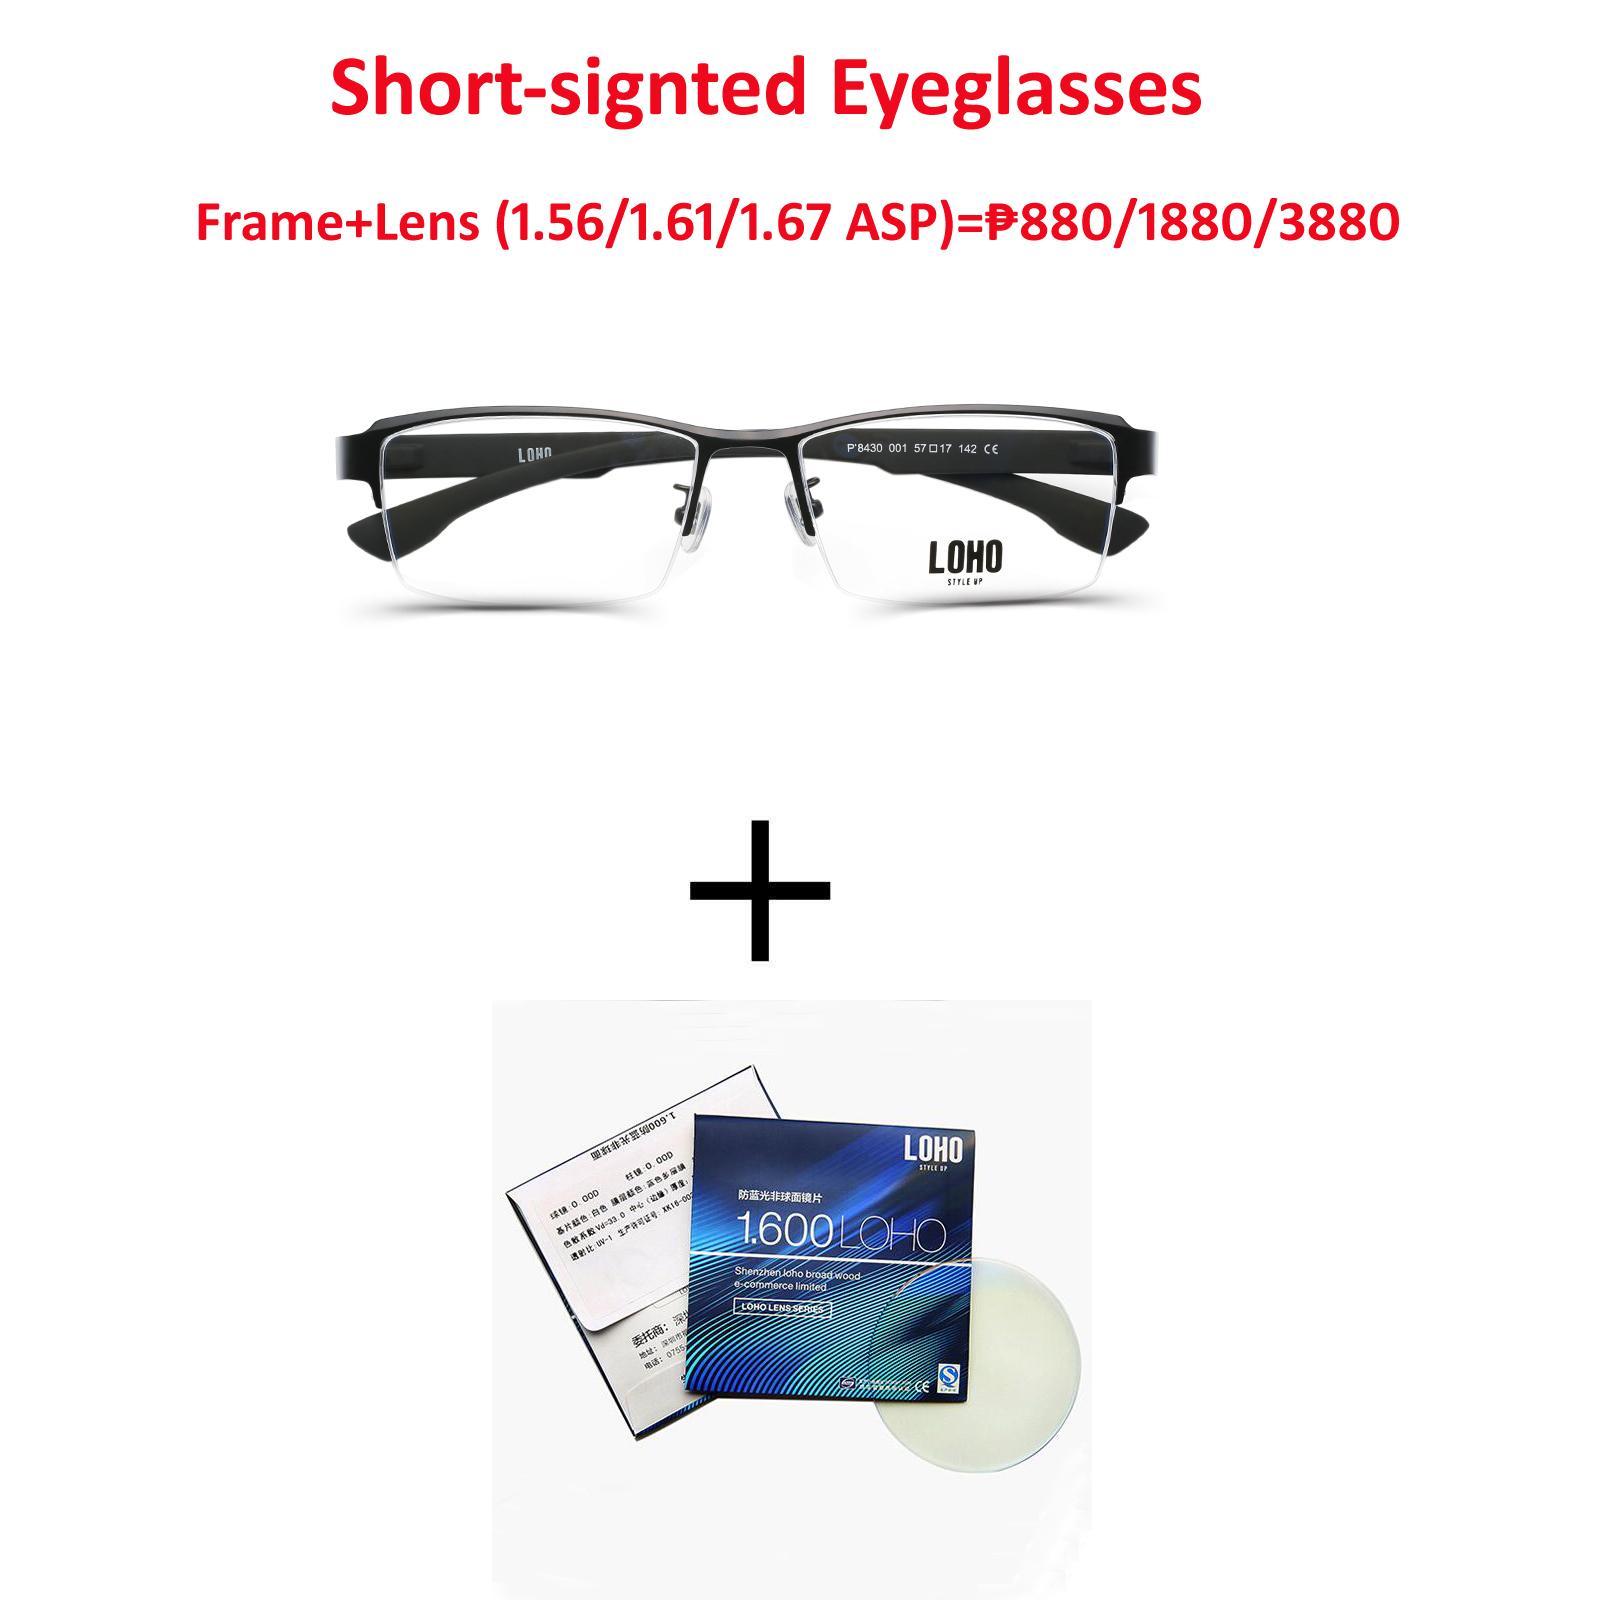 Unisex Square Prescription Eyeglass Frame with Clear Lens For Prescription  Rx Glasses Spectacles 8430 7796baf77fb7